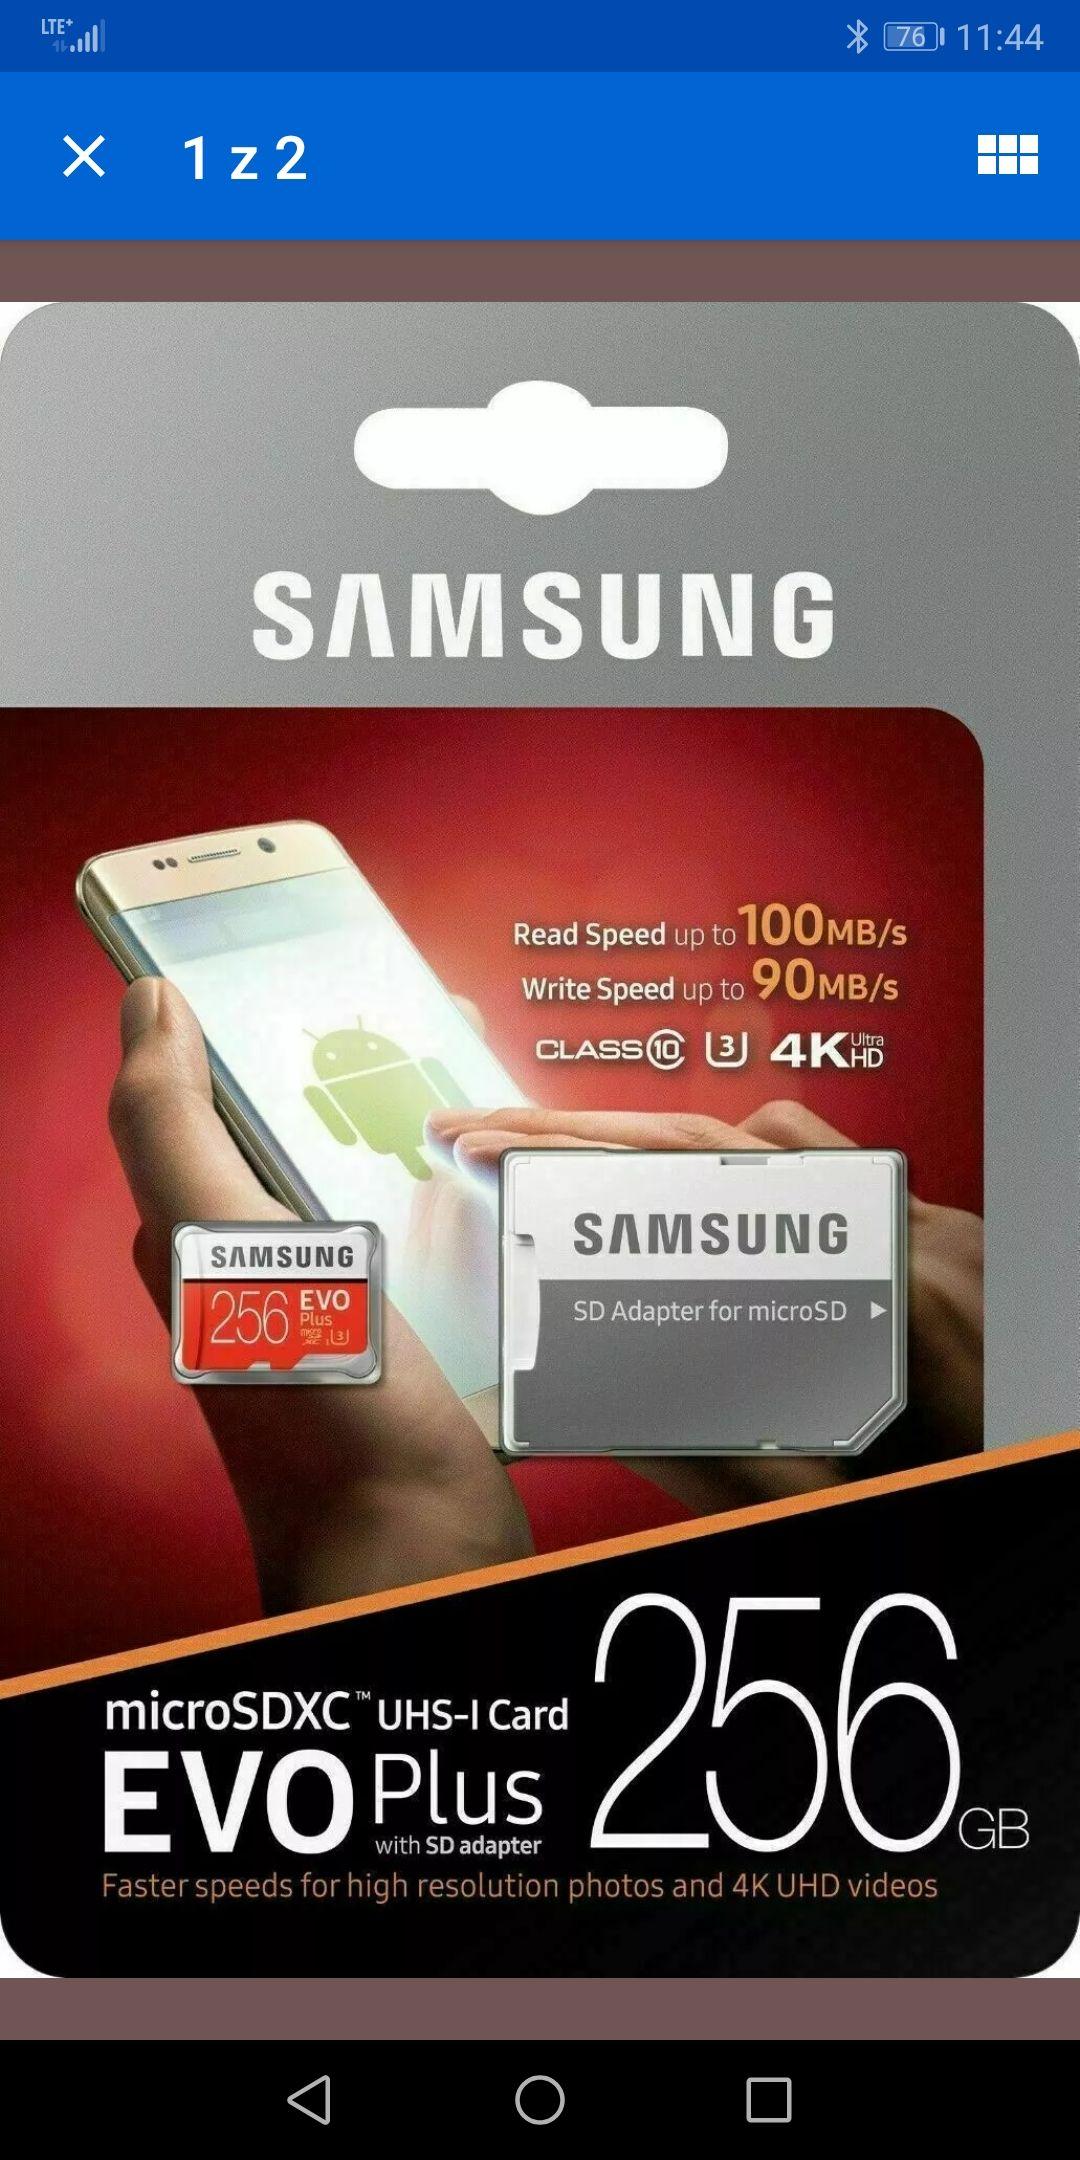 Karta microSDXC Samsung Evo Plus 256GB 12,99$